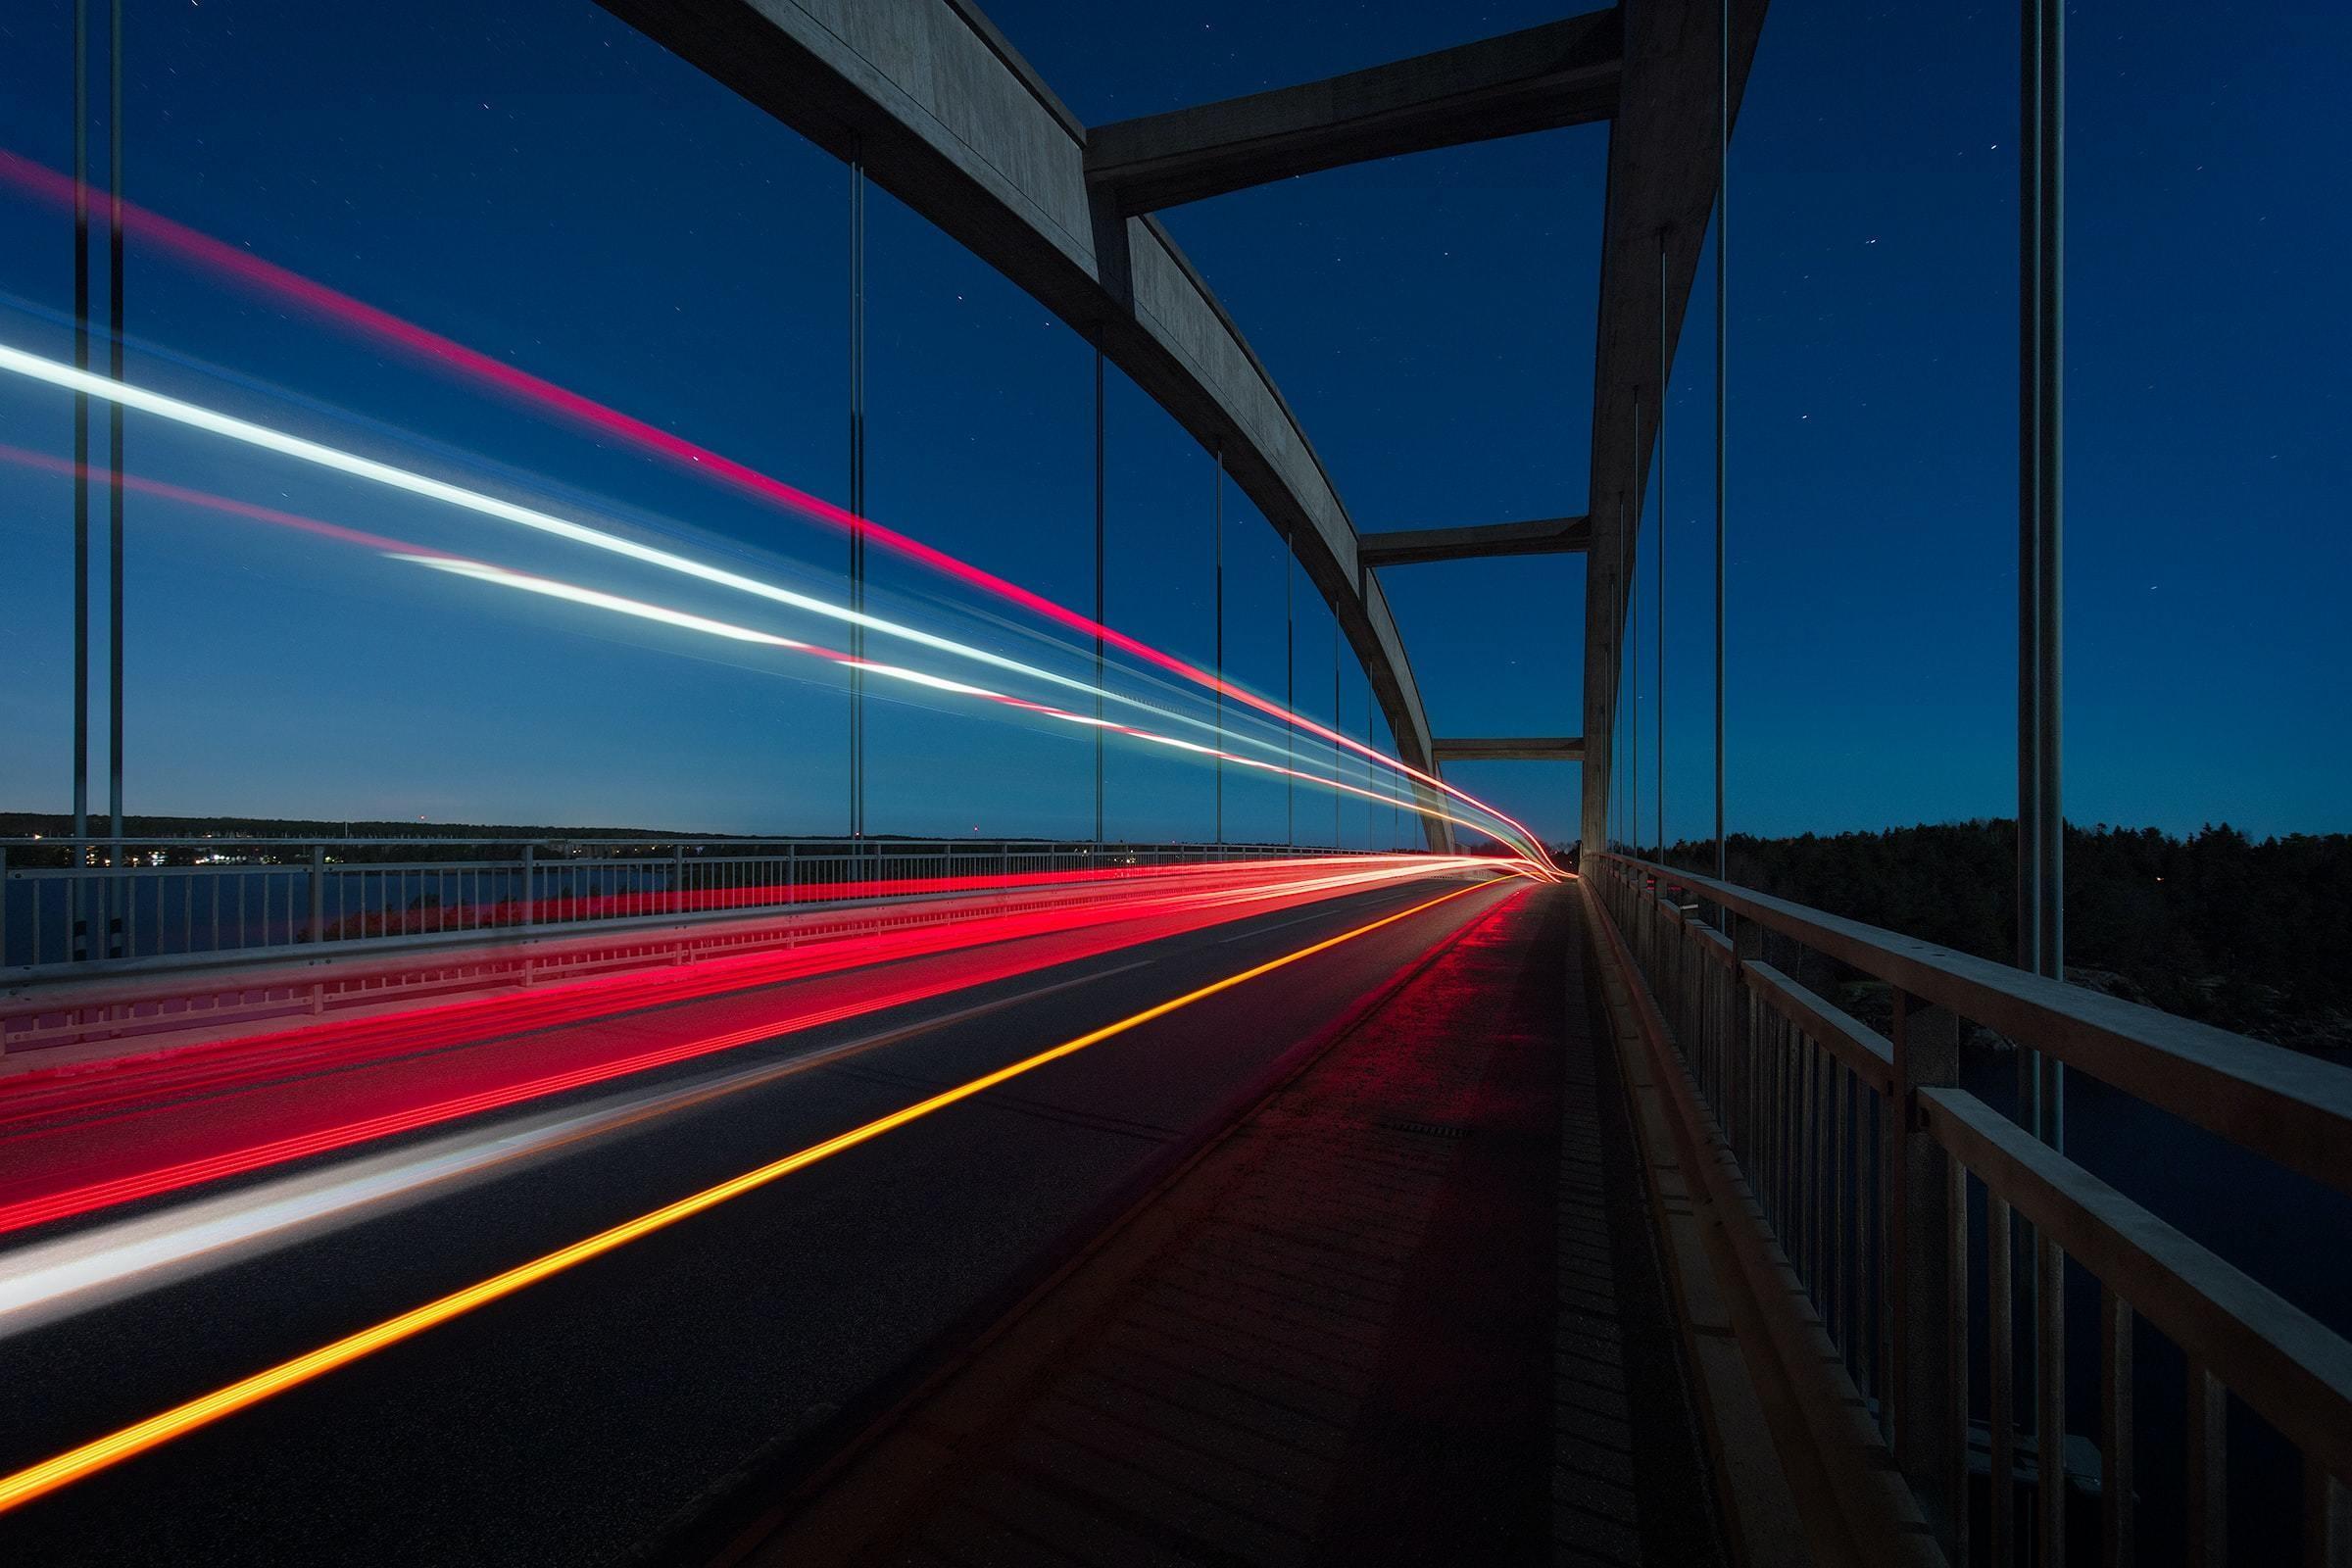 Night, bridge, traffic, car lights red yellow white; long exposure nighttime shot of traffic on bridge; digital highway